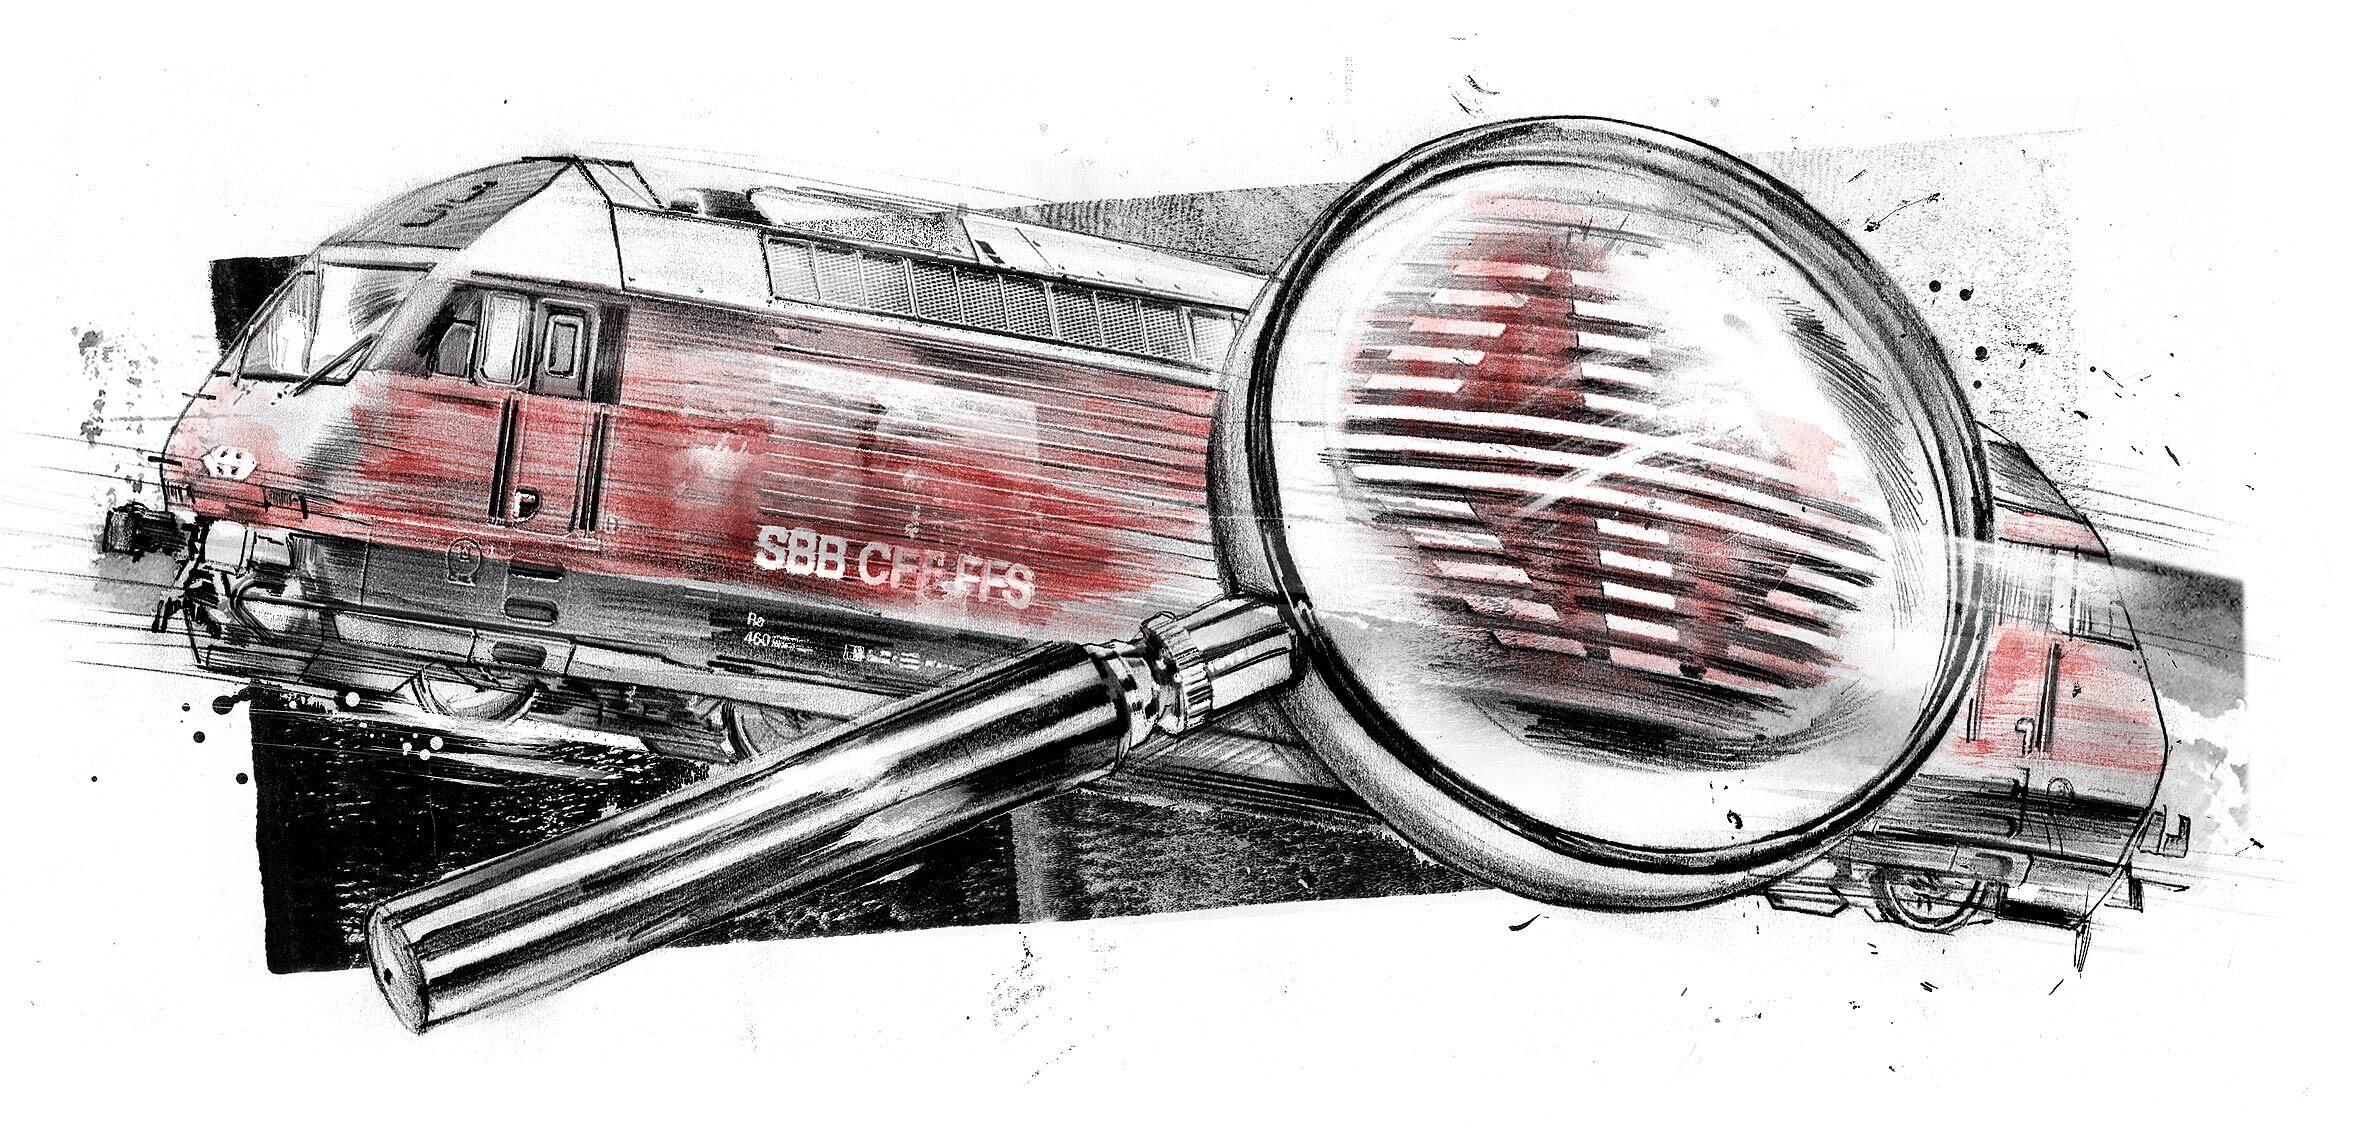 SBB Lokomotive illustration - Kornel Illustration   Kornel Stadler portfolio